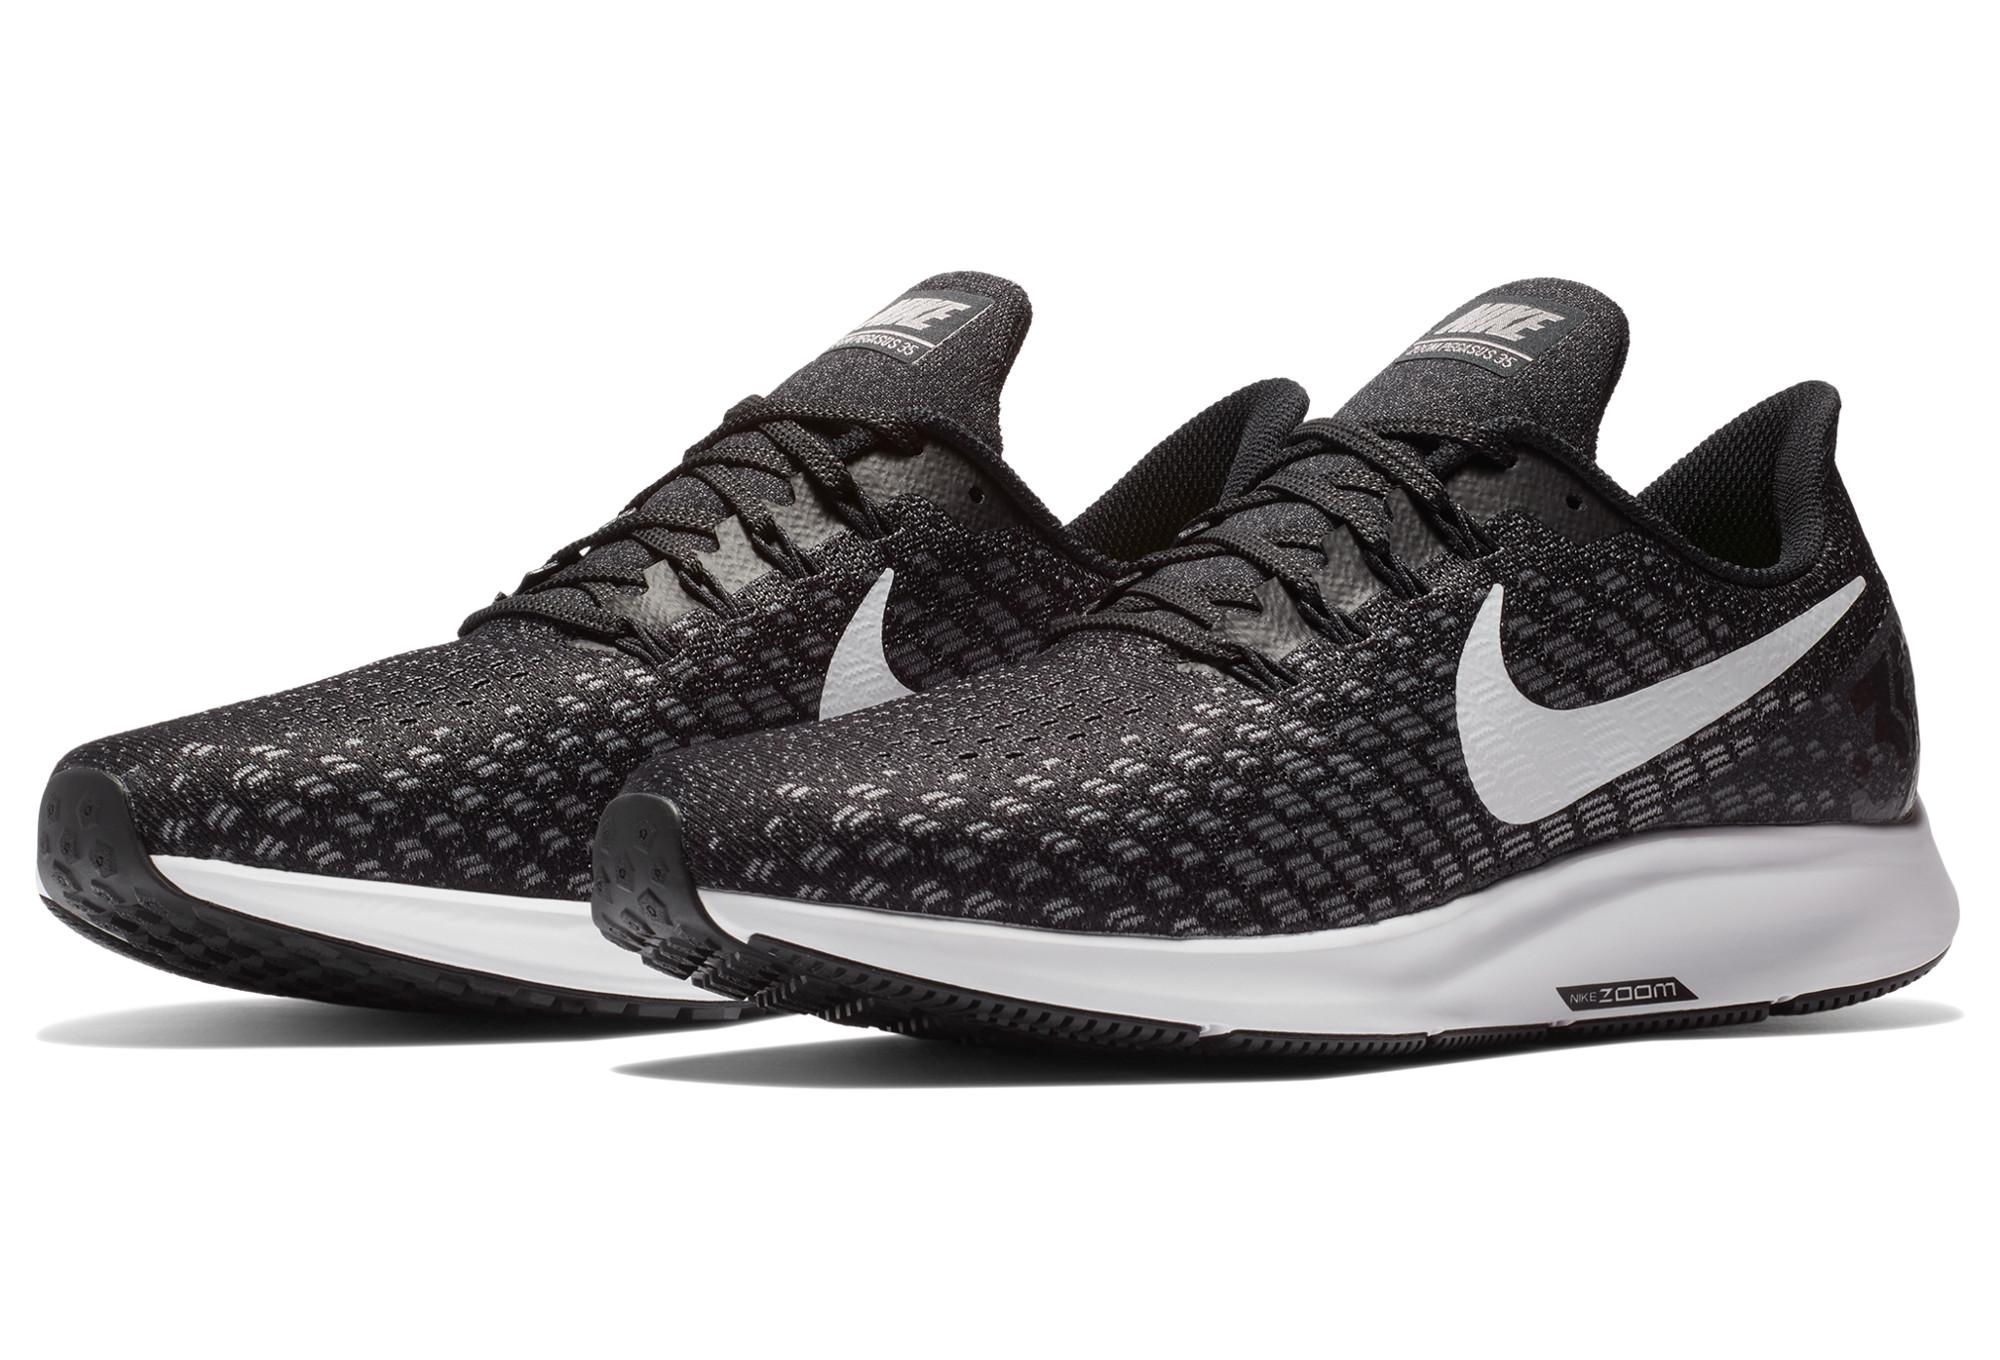 new styles 13947 e9c60 Nike Shoes Air Zoom Pegasus 35 Black Men